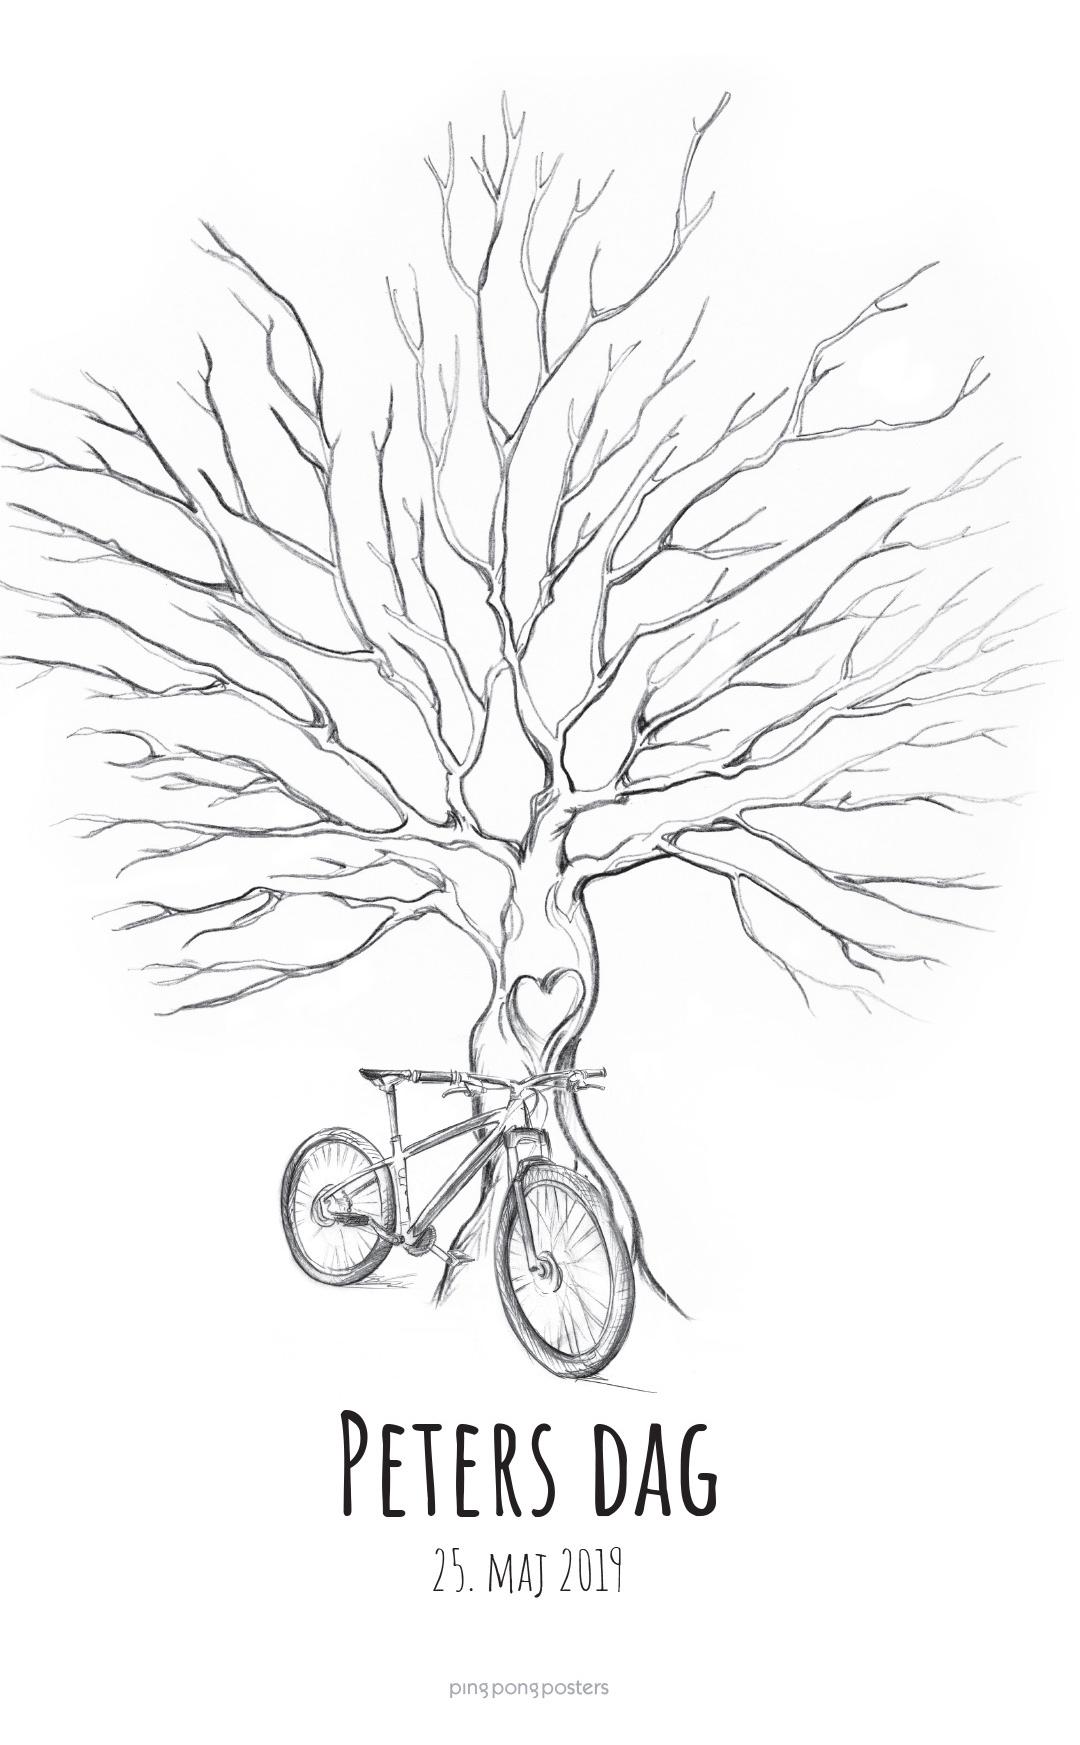 Fingeraftryk plakat træ med en cykel foran træstammen